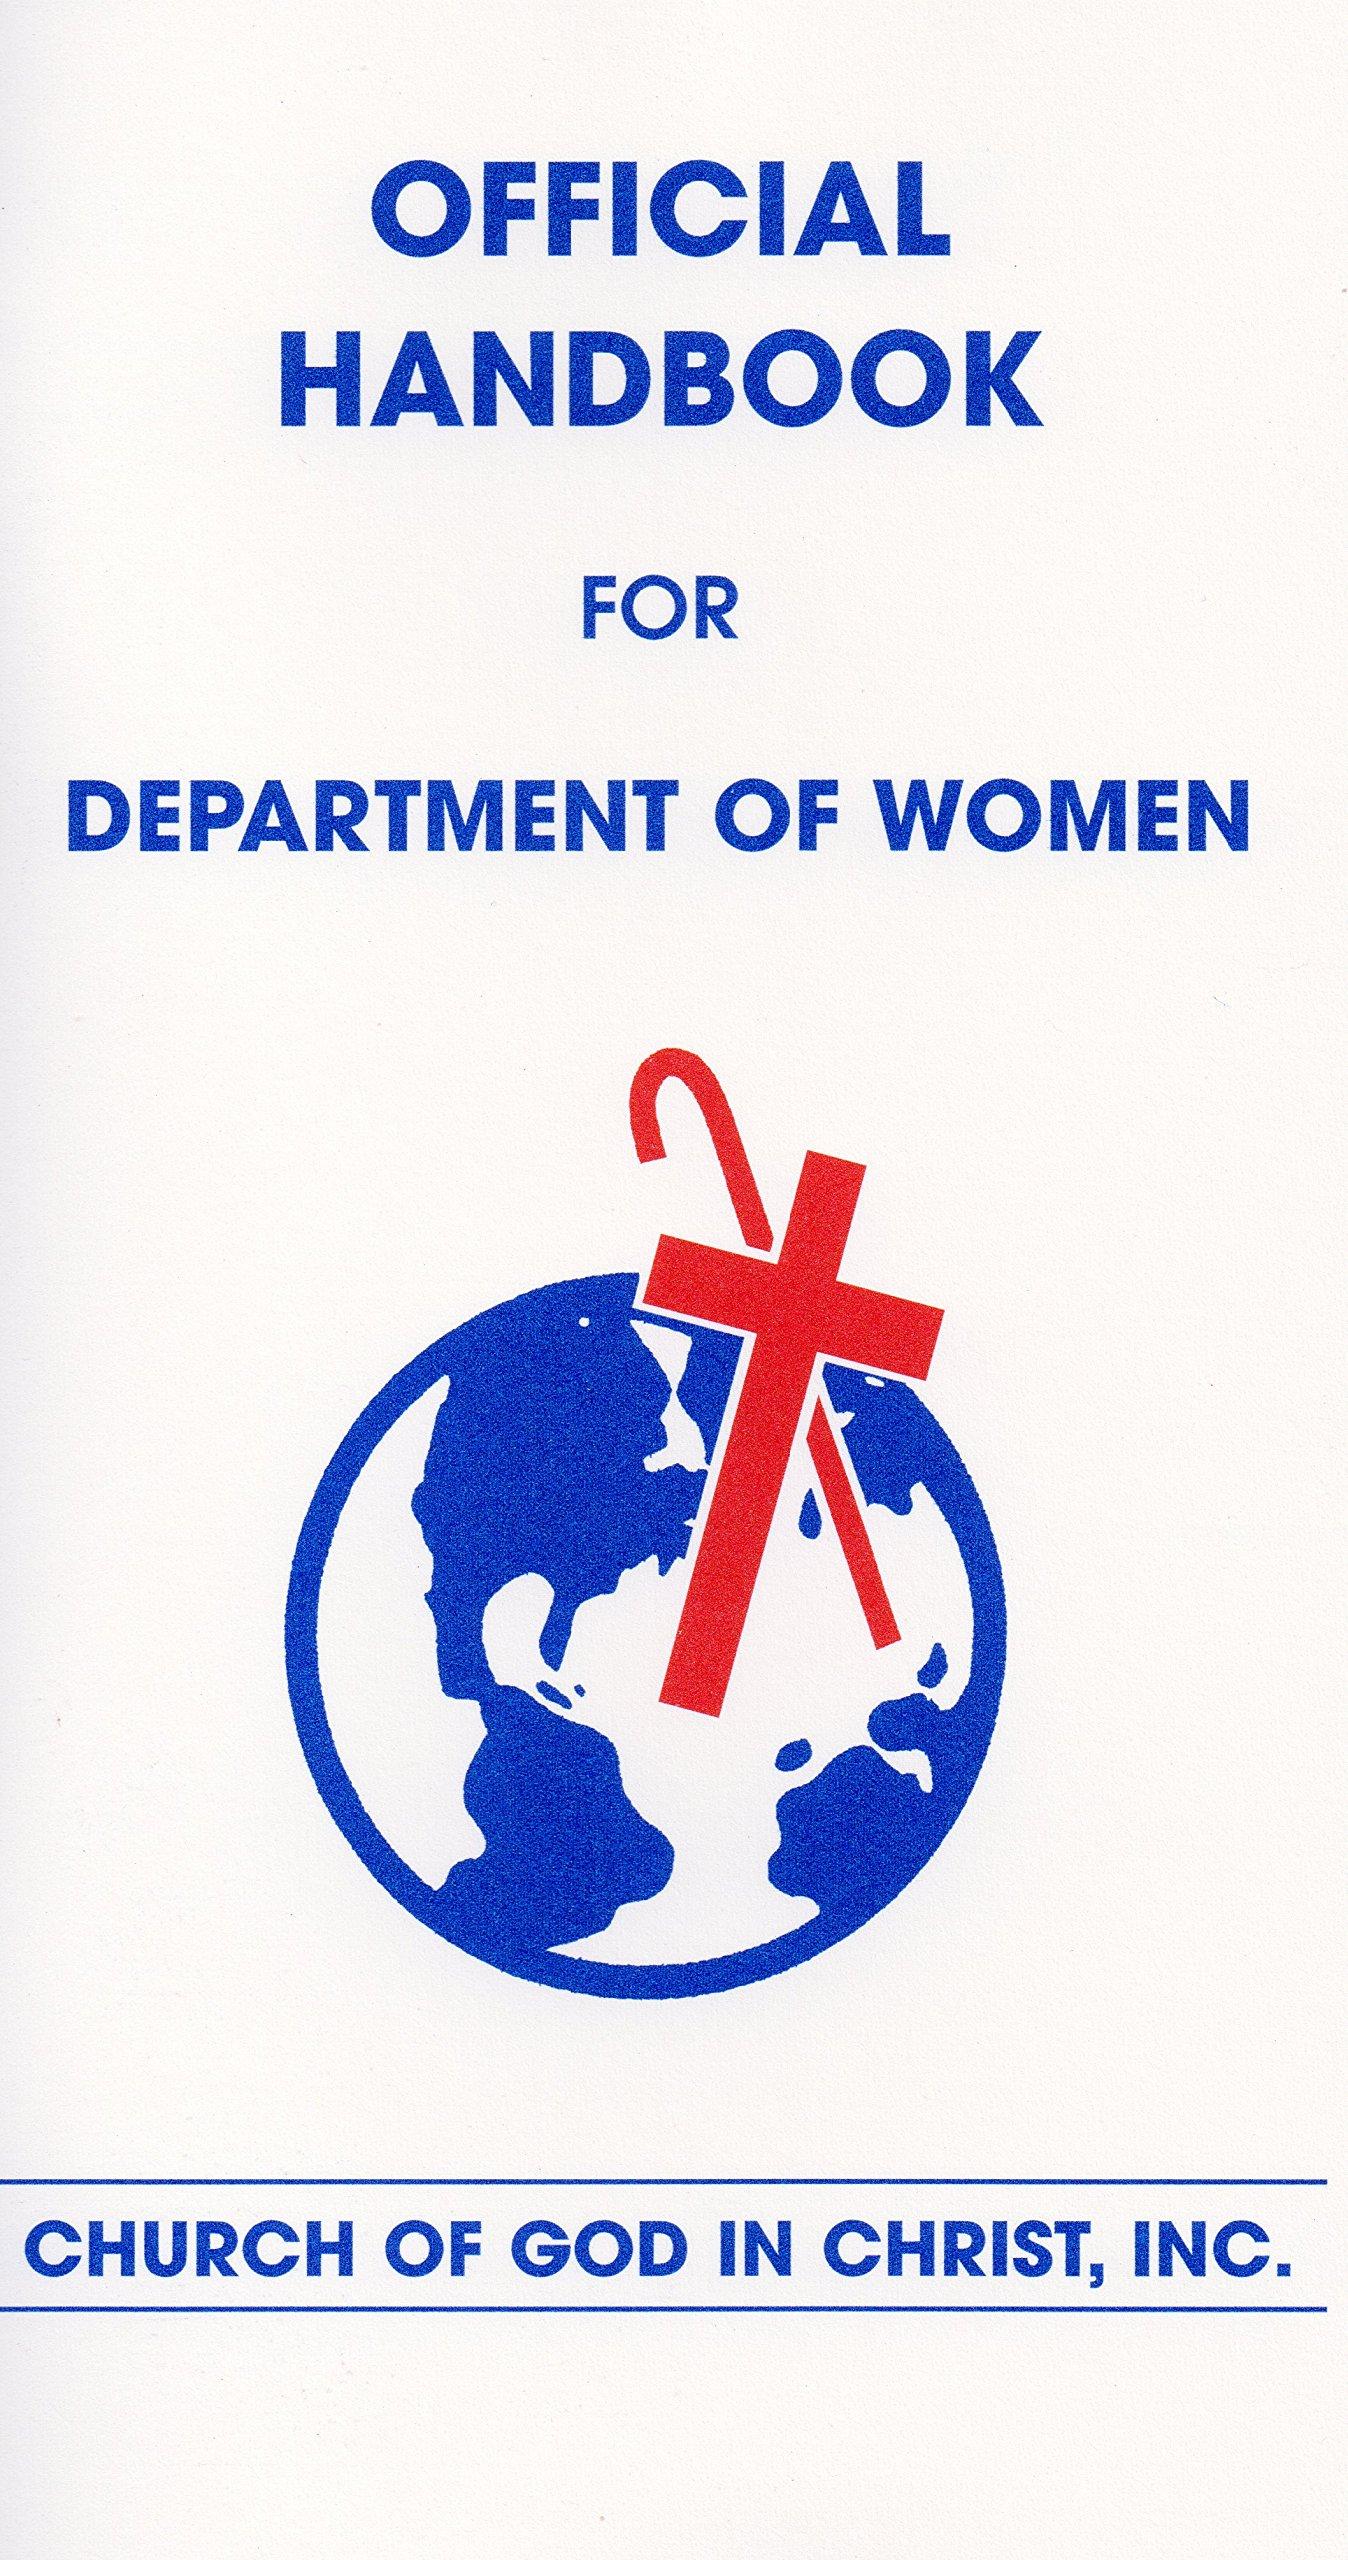 Official Handbook for Department of Women: 9781940378435: Amazon.com: Books